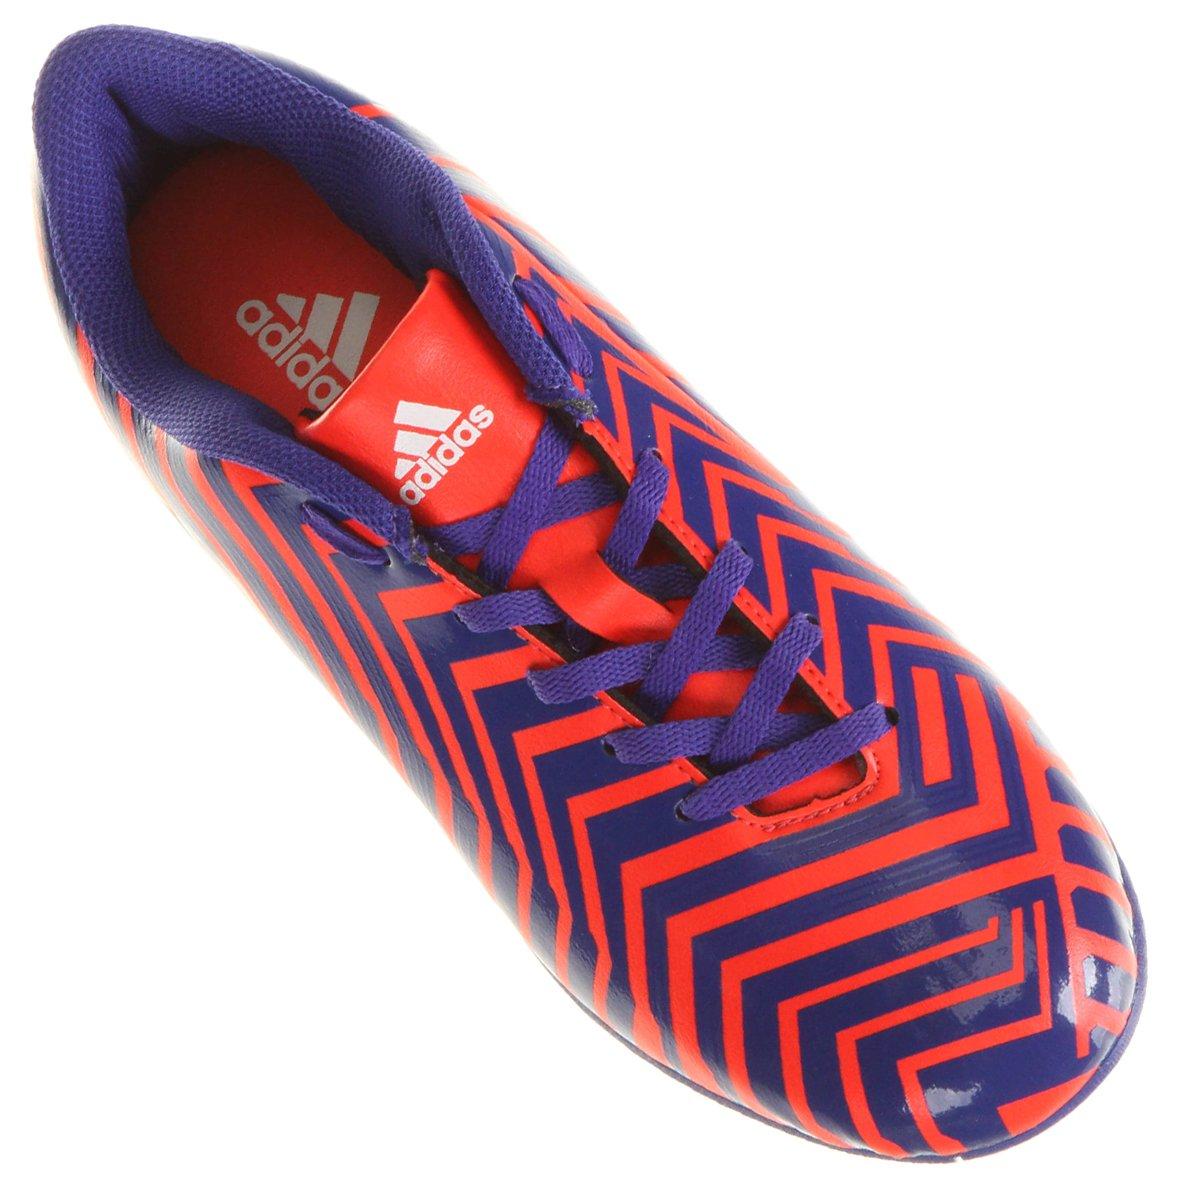 Chuteira Adidas Predito Instinct TF Society - Compre Agora  b53884df3d622